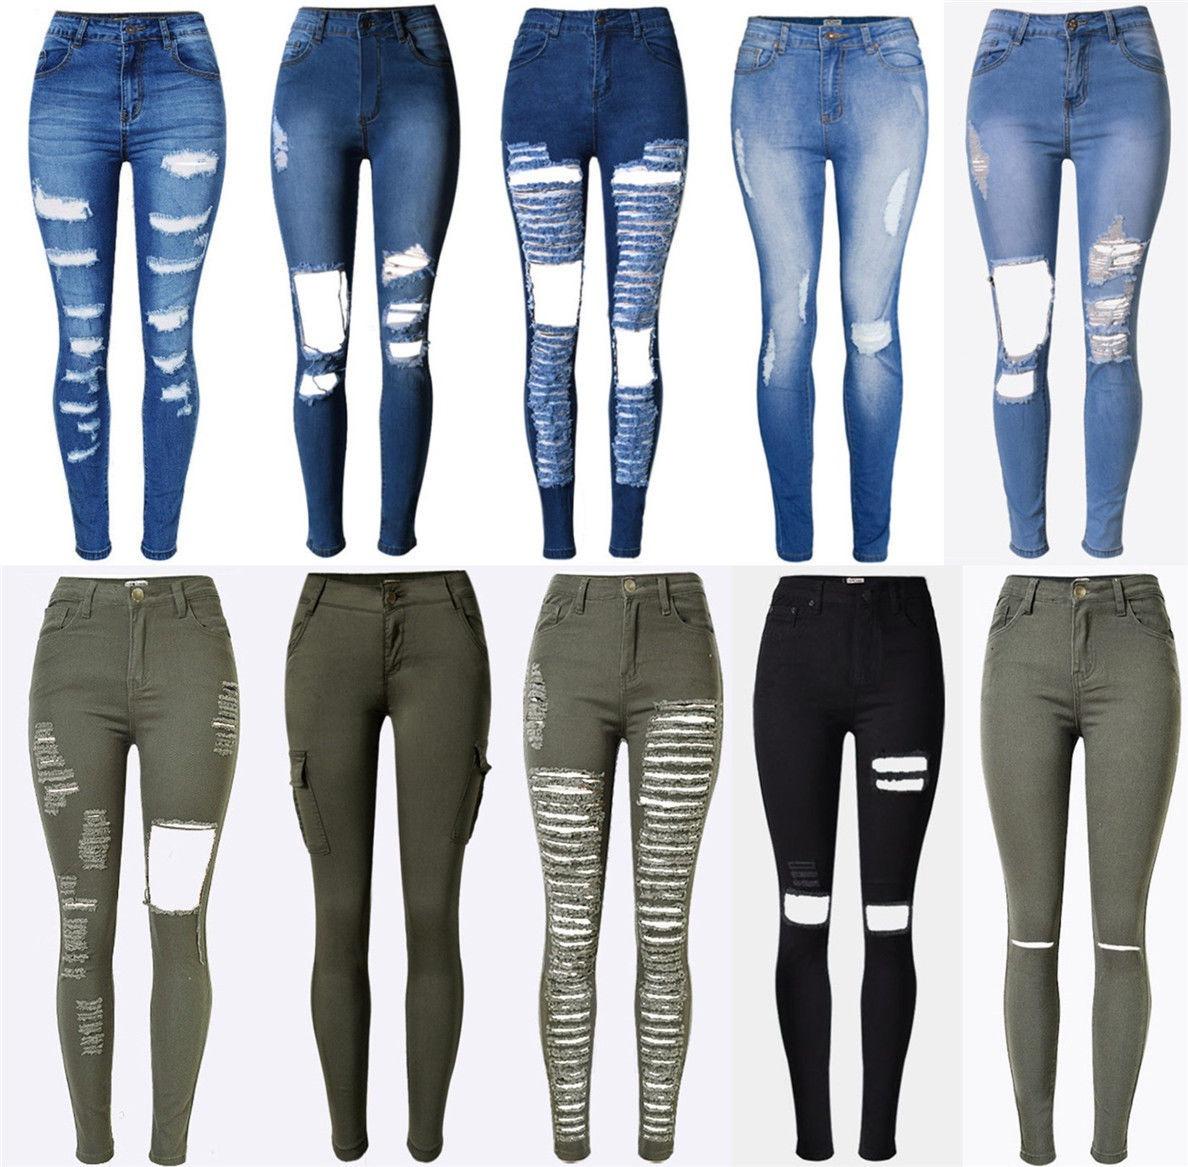 حامض أذن تخرج Jeans Rotos Mujer 2018 Caallenblog Com